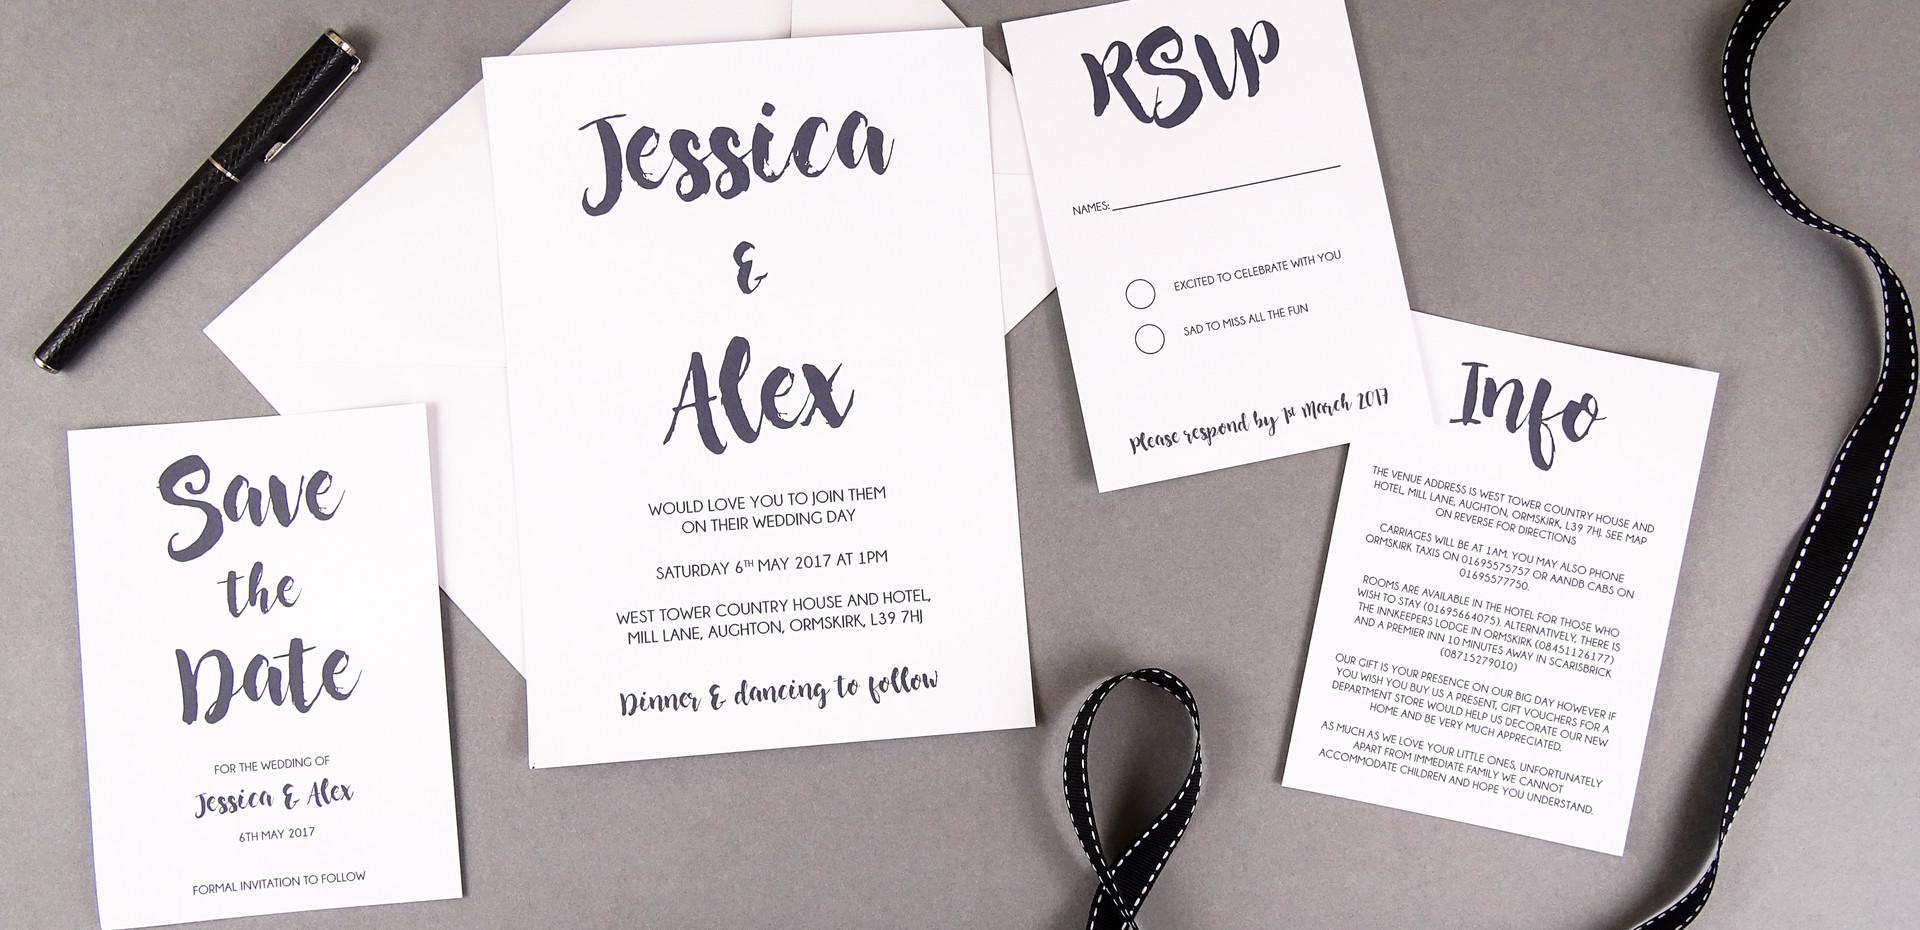 Marker Pen Bespoke Wedding Invitations, Save the Dates, RSVPs and Wedding Menus personalised wedding stationery by Bespoke Invites